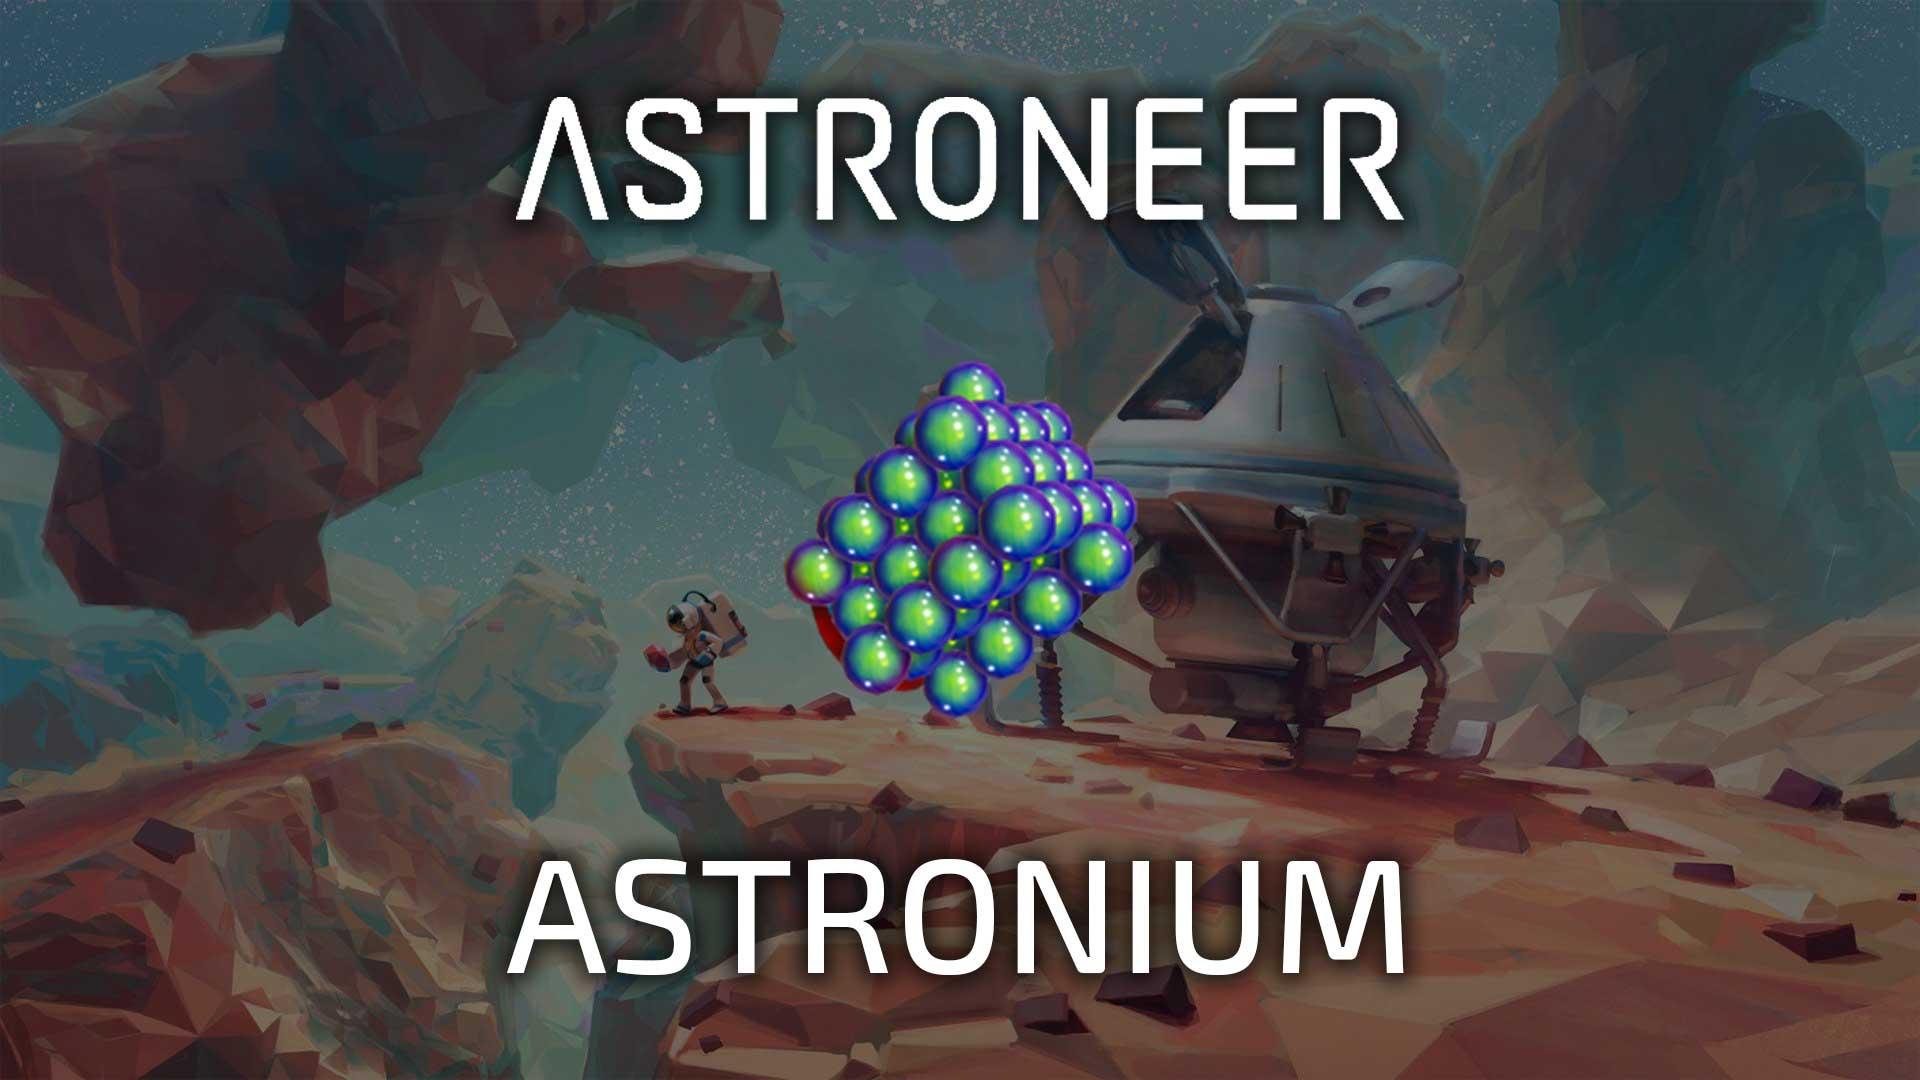 astroneer astronium